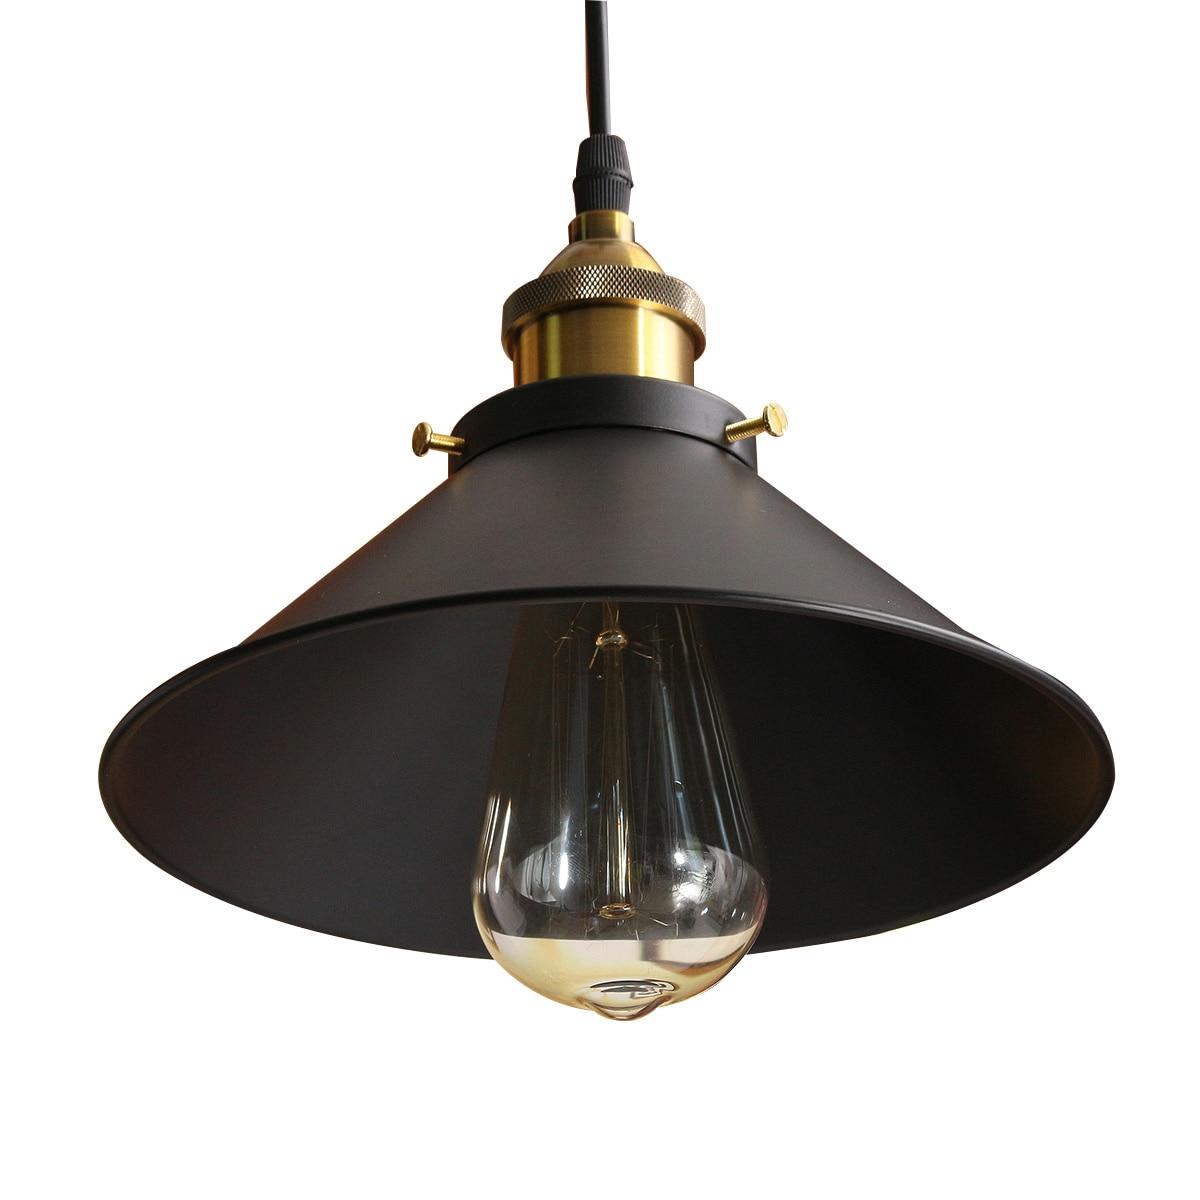 cheapest Vintage Iron Wood Grain Shop Pendant Lamp E27 Lamp Holder 110-240V Foyer Coffee House Dining Hall Indoor Bedroom Lightings